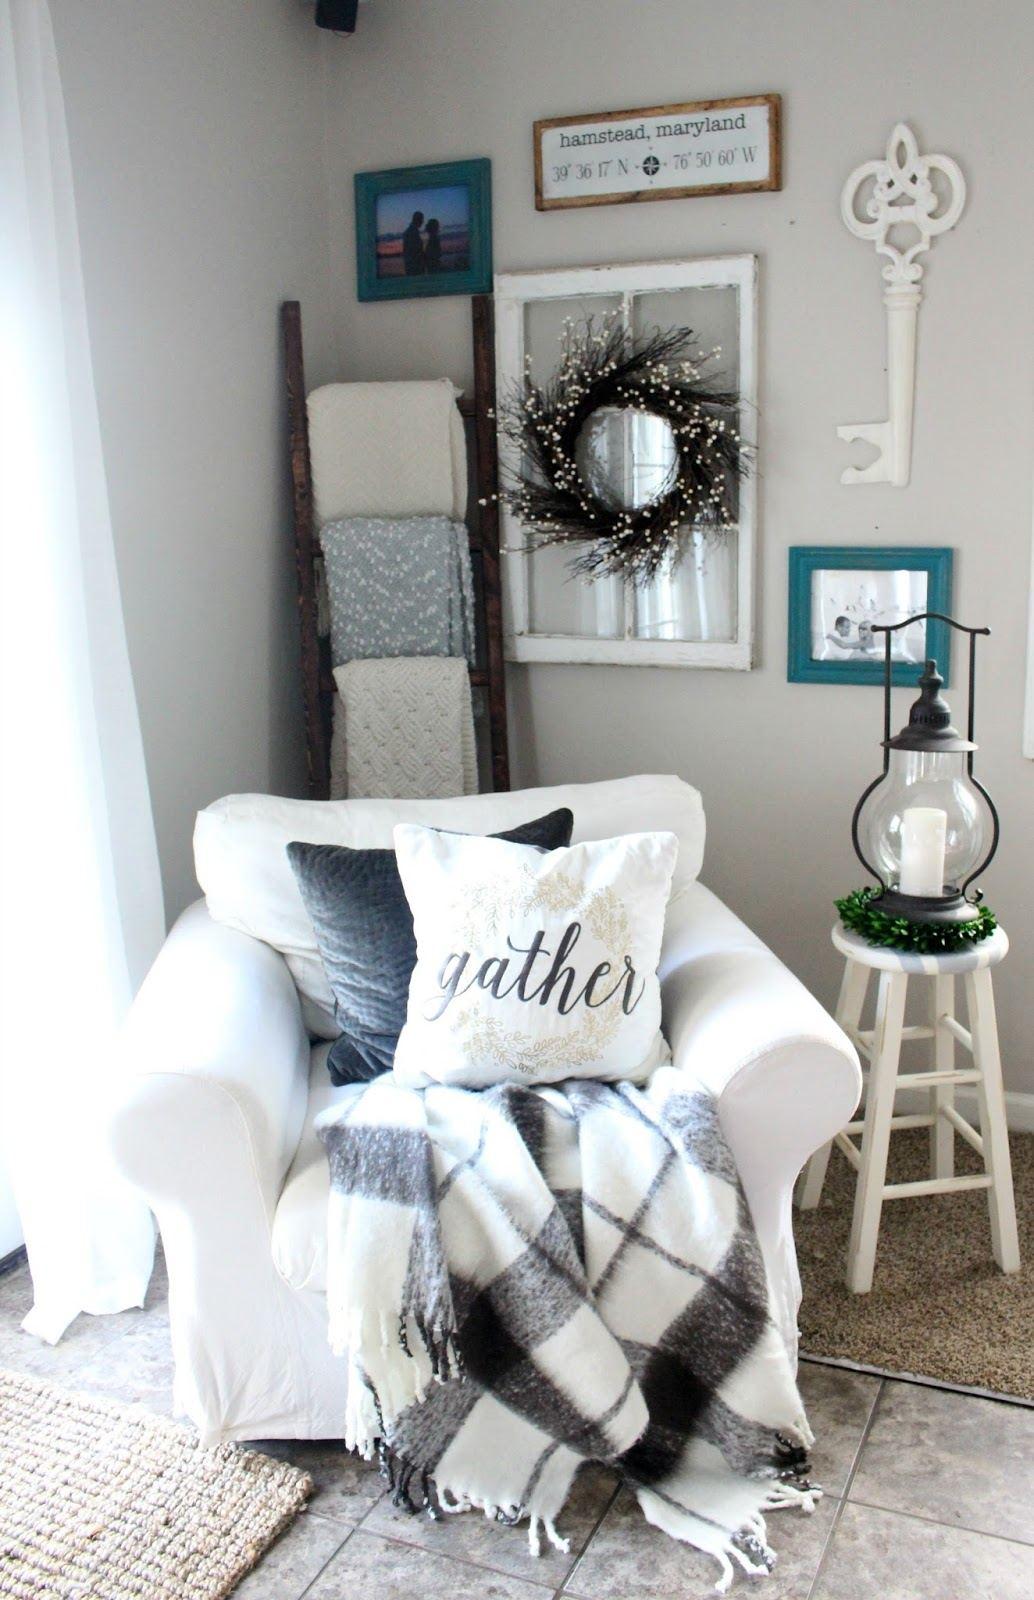 27 Rustic Farmhouse Living Room Decor Ideas for Your Home ... on Farmhouse Style Living Room Curtains  id=43751